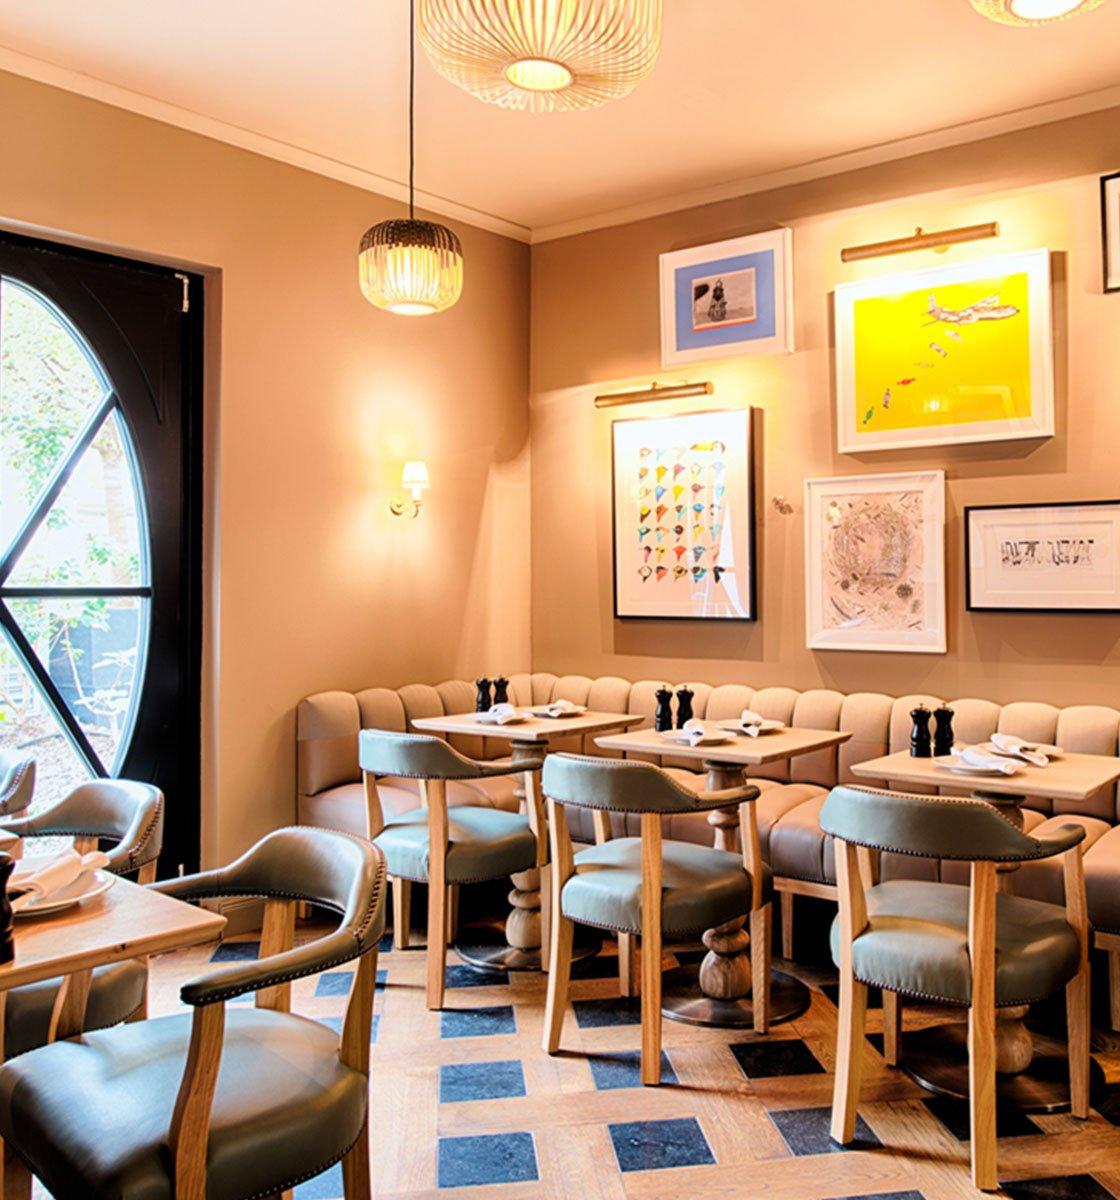 Bespoke Banquette in brightly lit restaurant